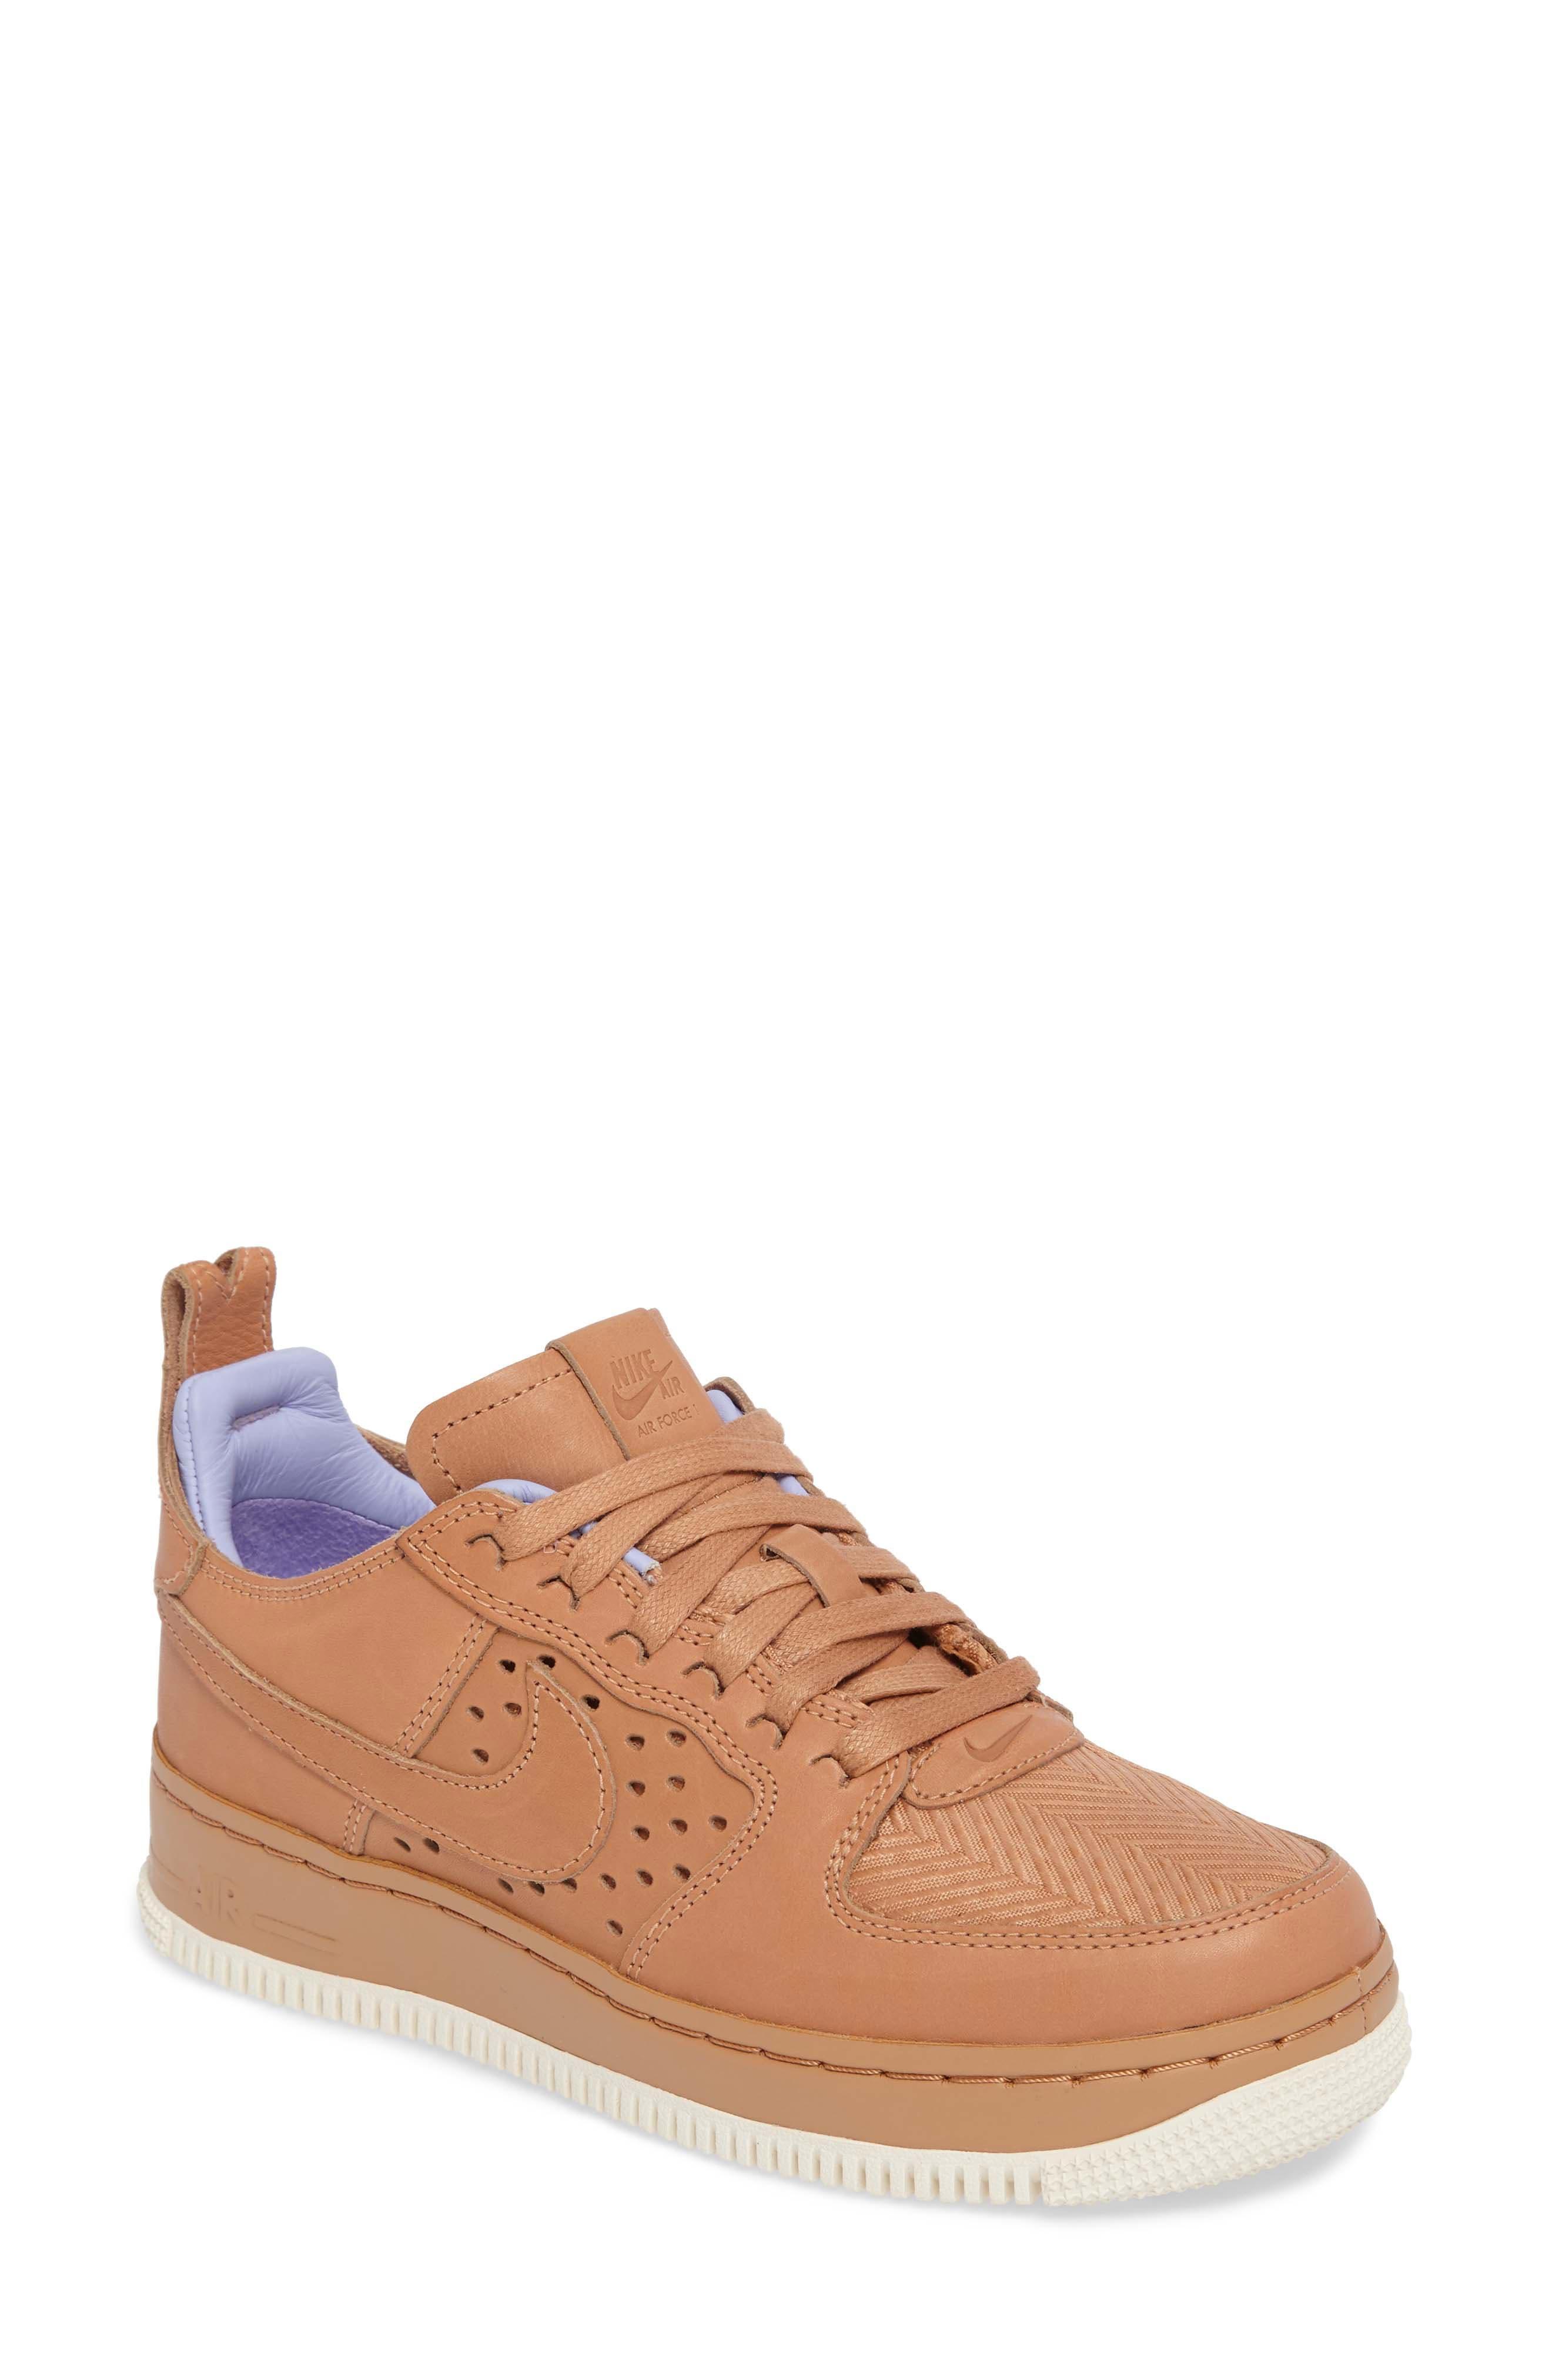 Main Image - Nike NikeLab Air Force 1 CMFT TC Sneaker (Women)